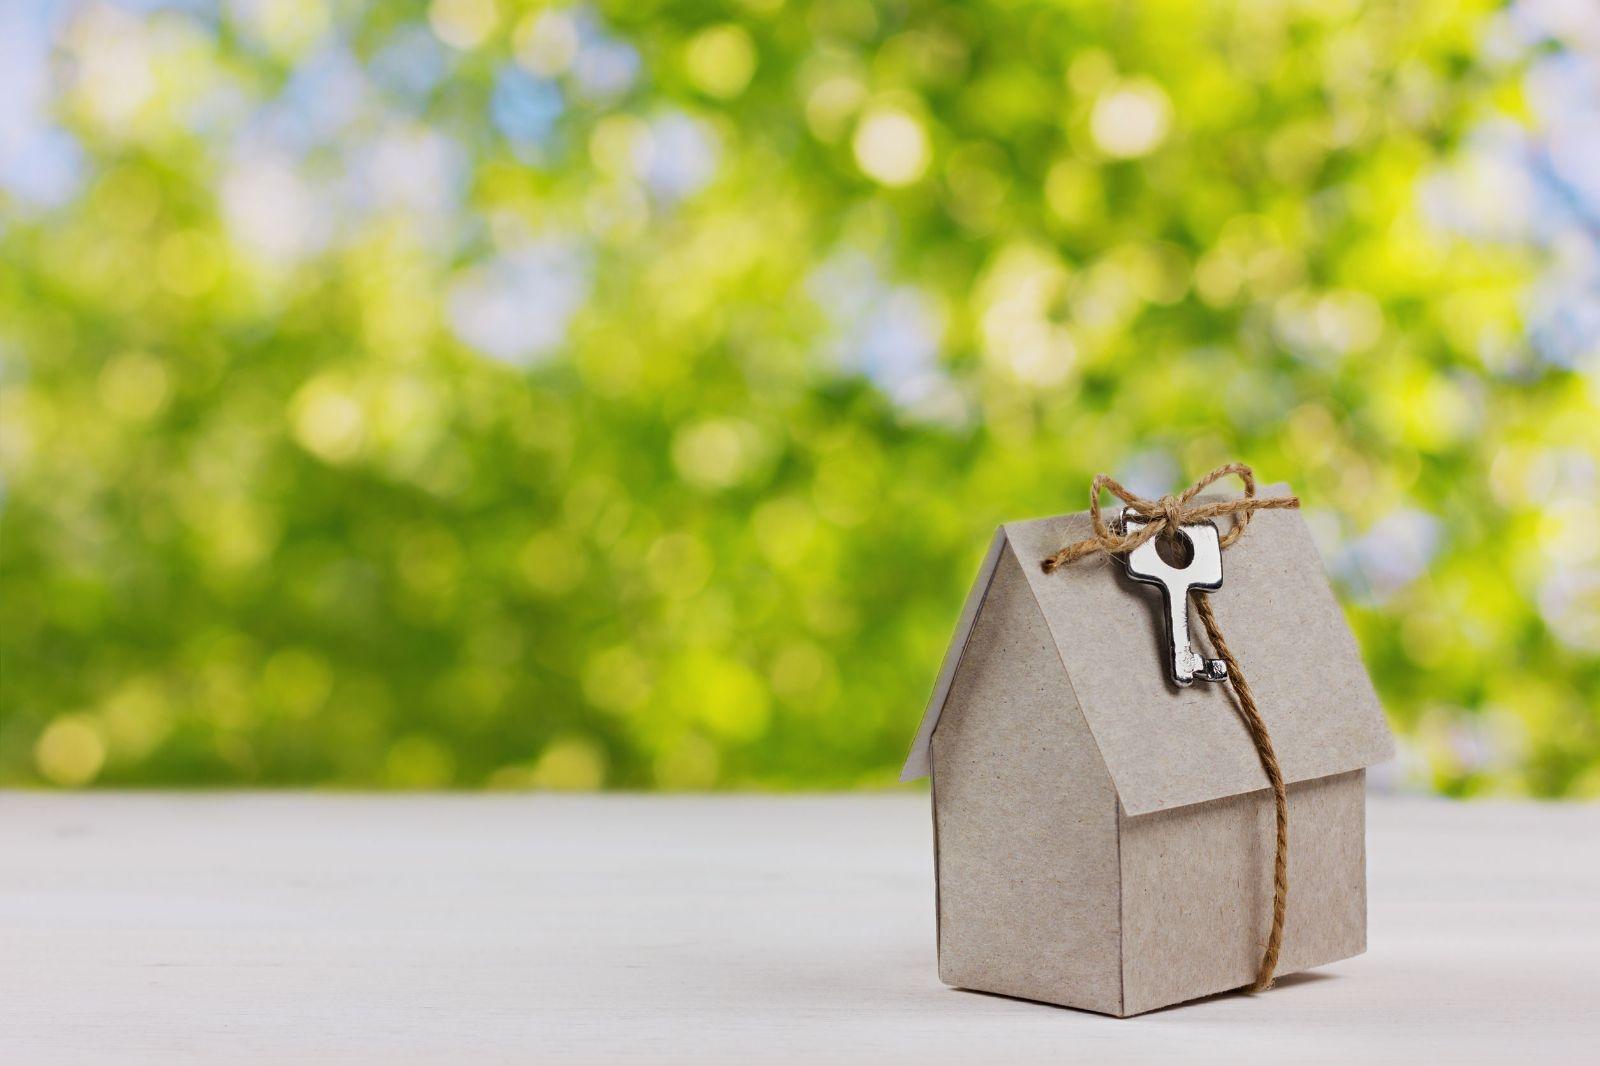 Koliko stane zavarovanje stanovanja